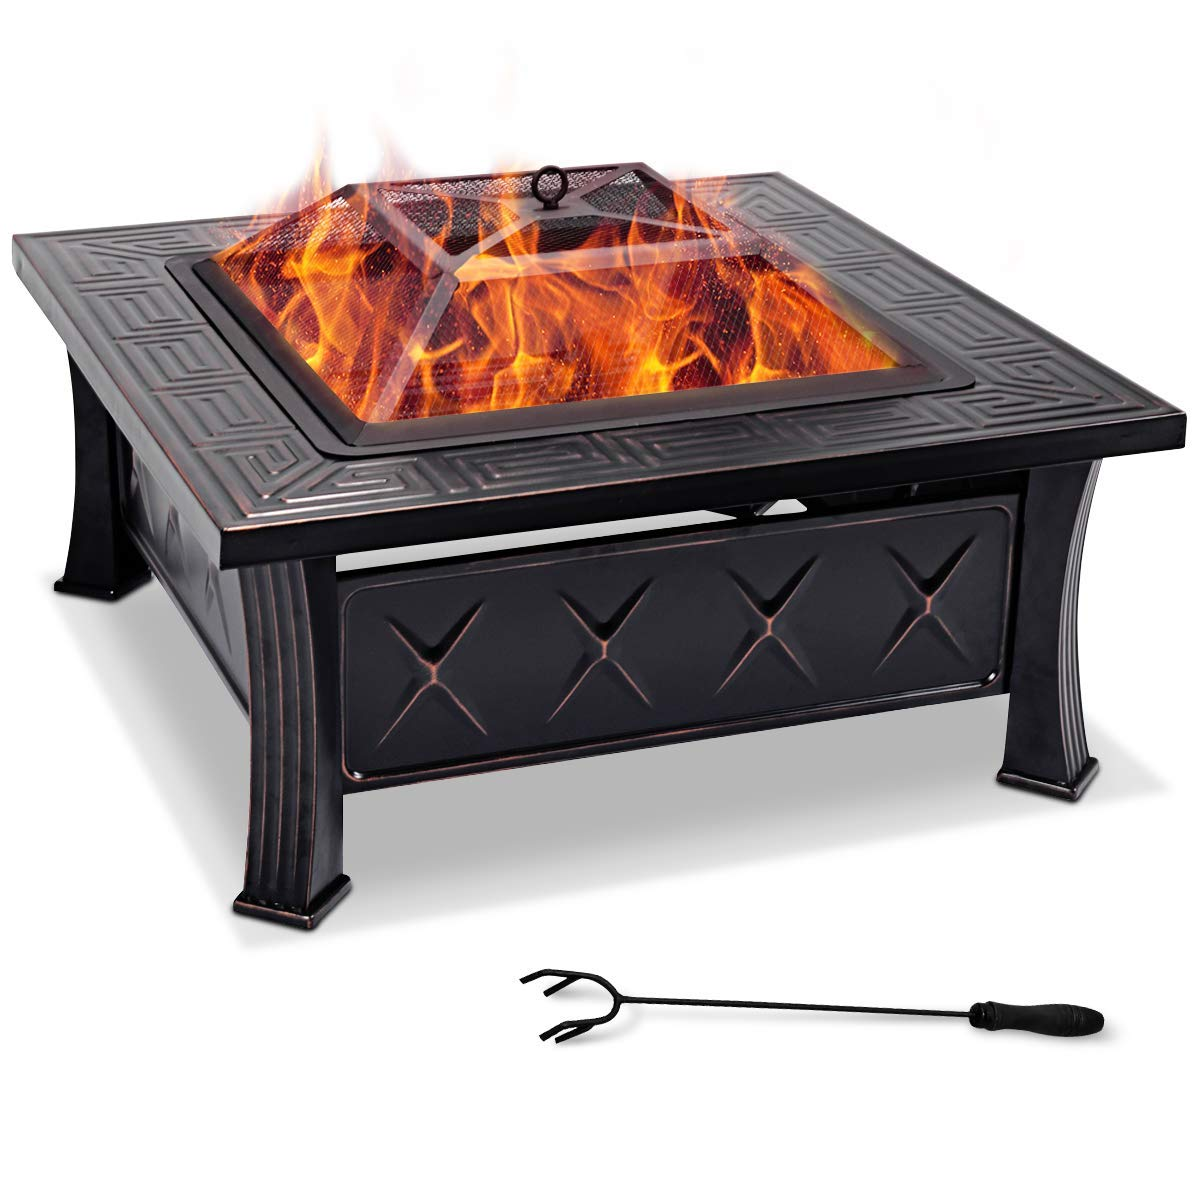 45 Stove r With Poke Pit Patio Generic ** quare CM Garden Heater CM Gard Square Fire B Fire-pit Braz Fire-pit Brazier With Poker ier With Pok